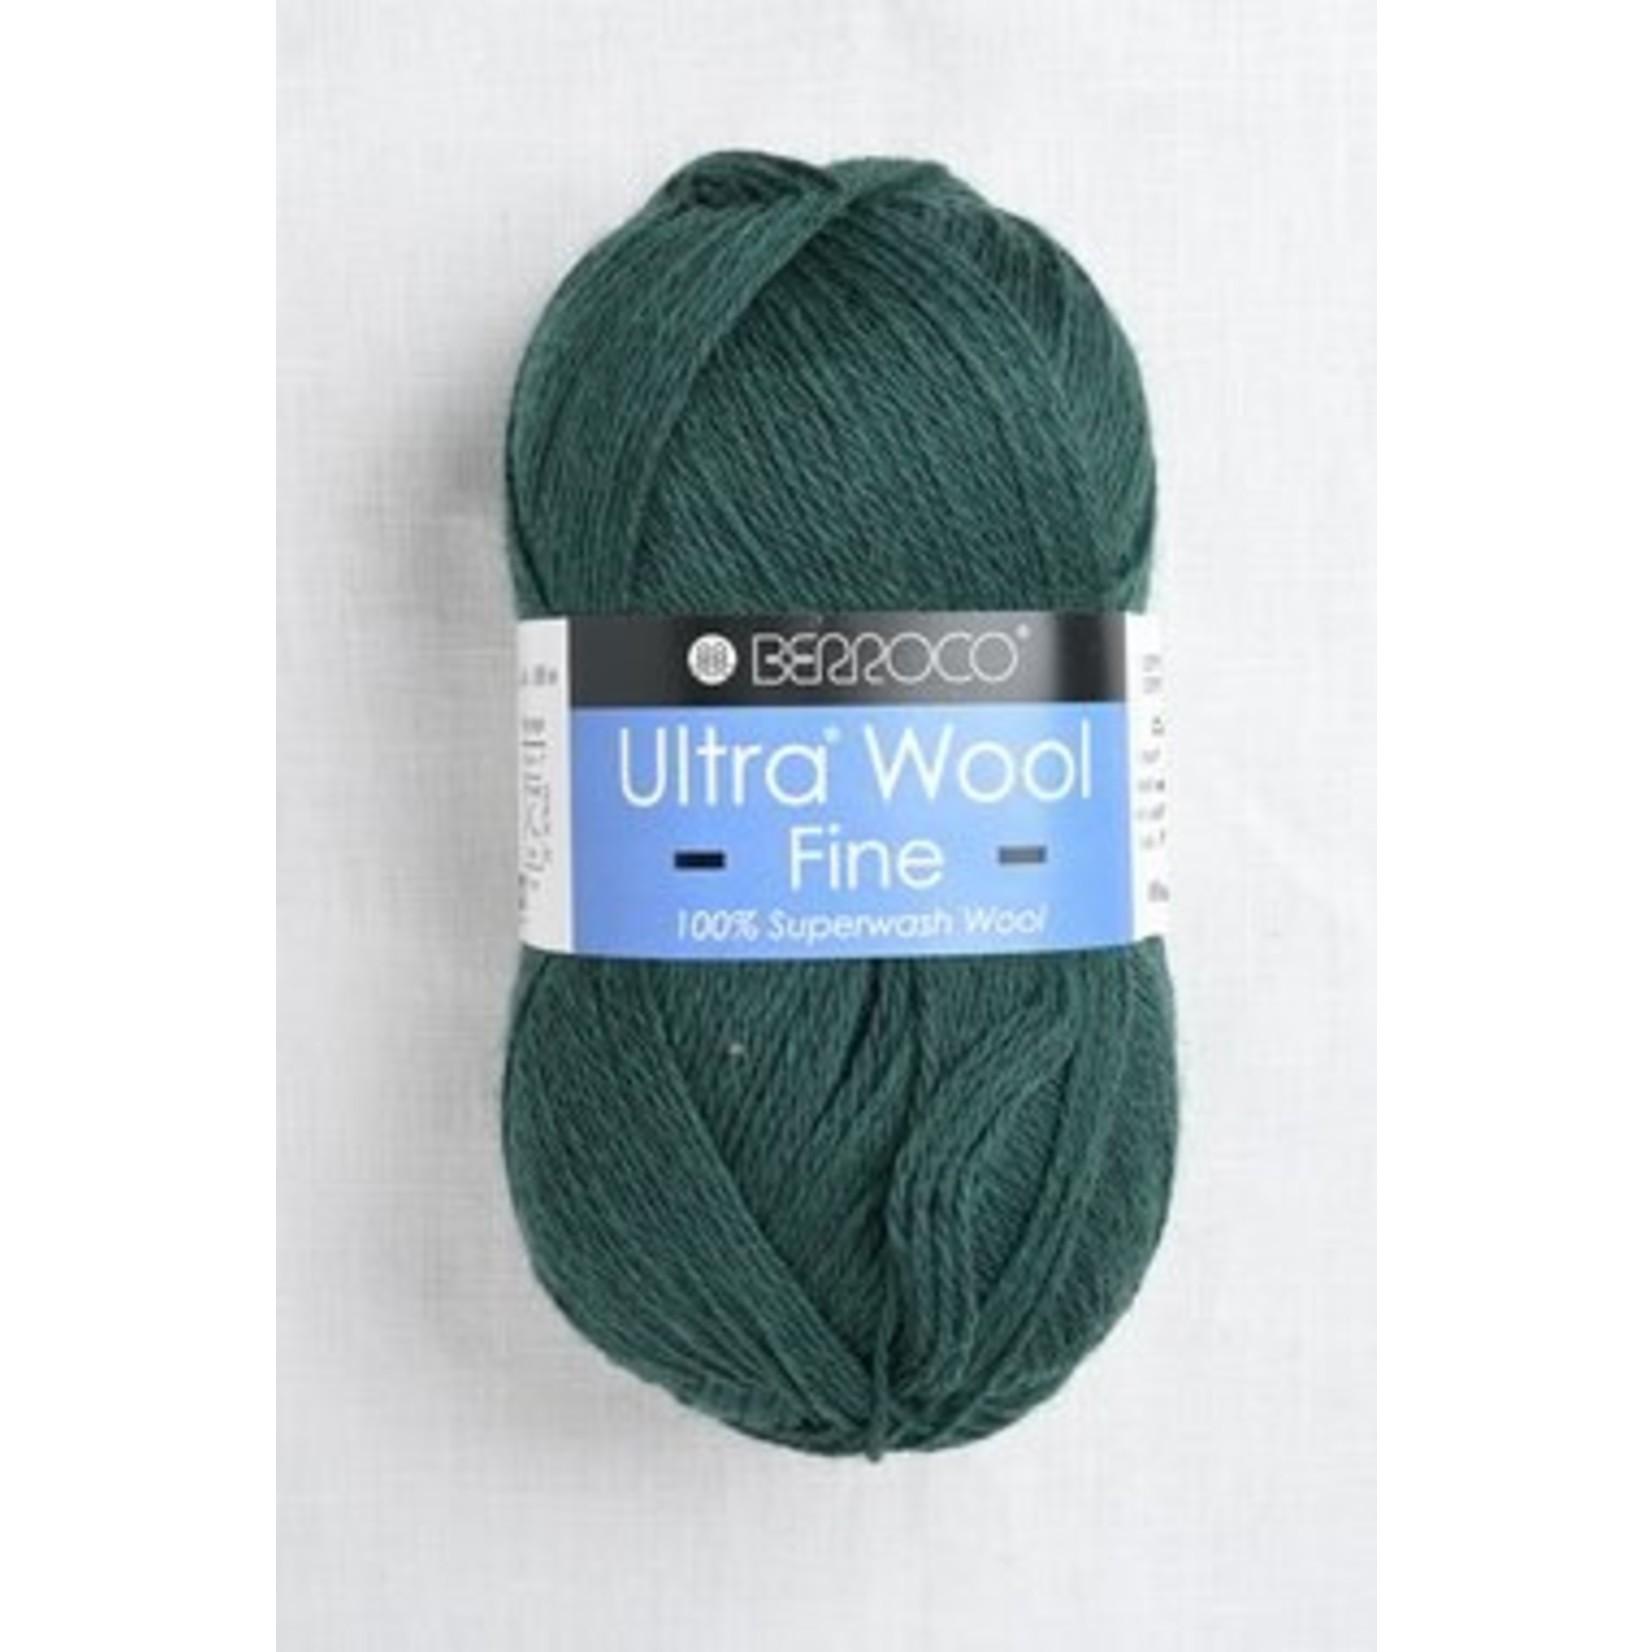 Berroco Berroco Ultra Wool Fine, 53149, Pine